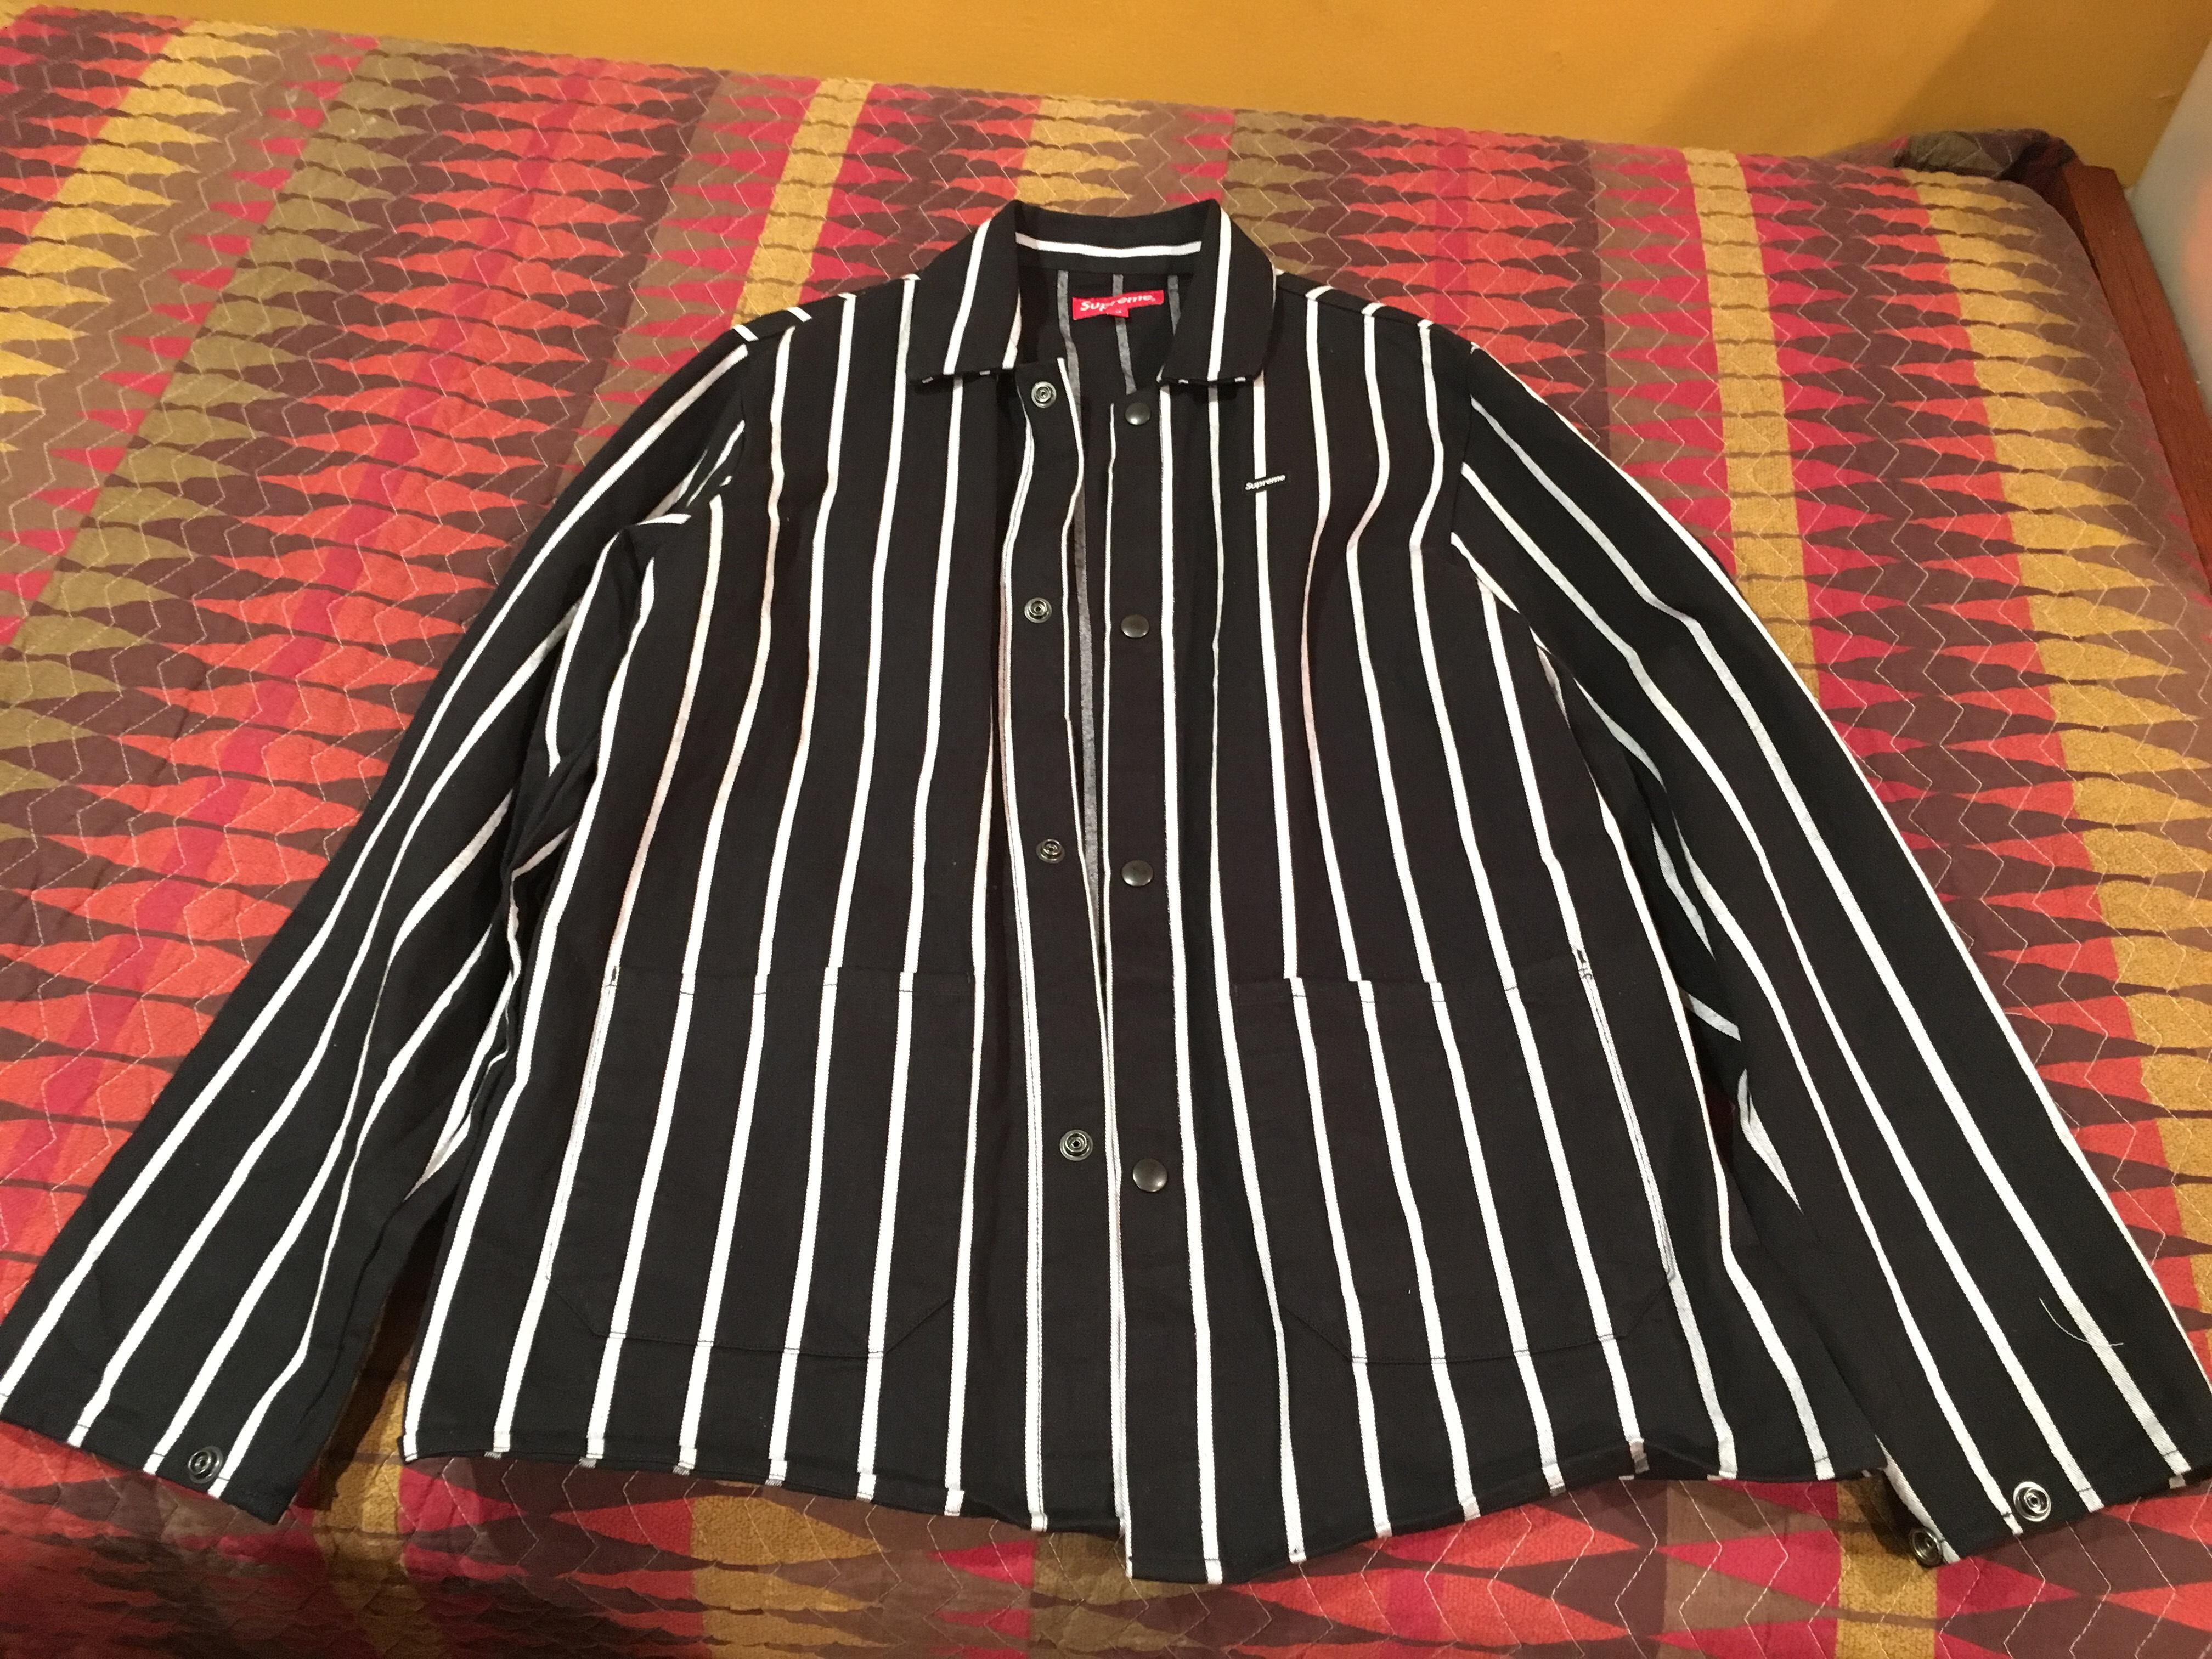 ffb90819683c Supreme Ss17 Shop Jacket